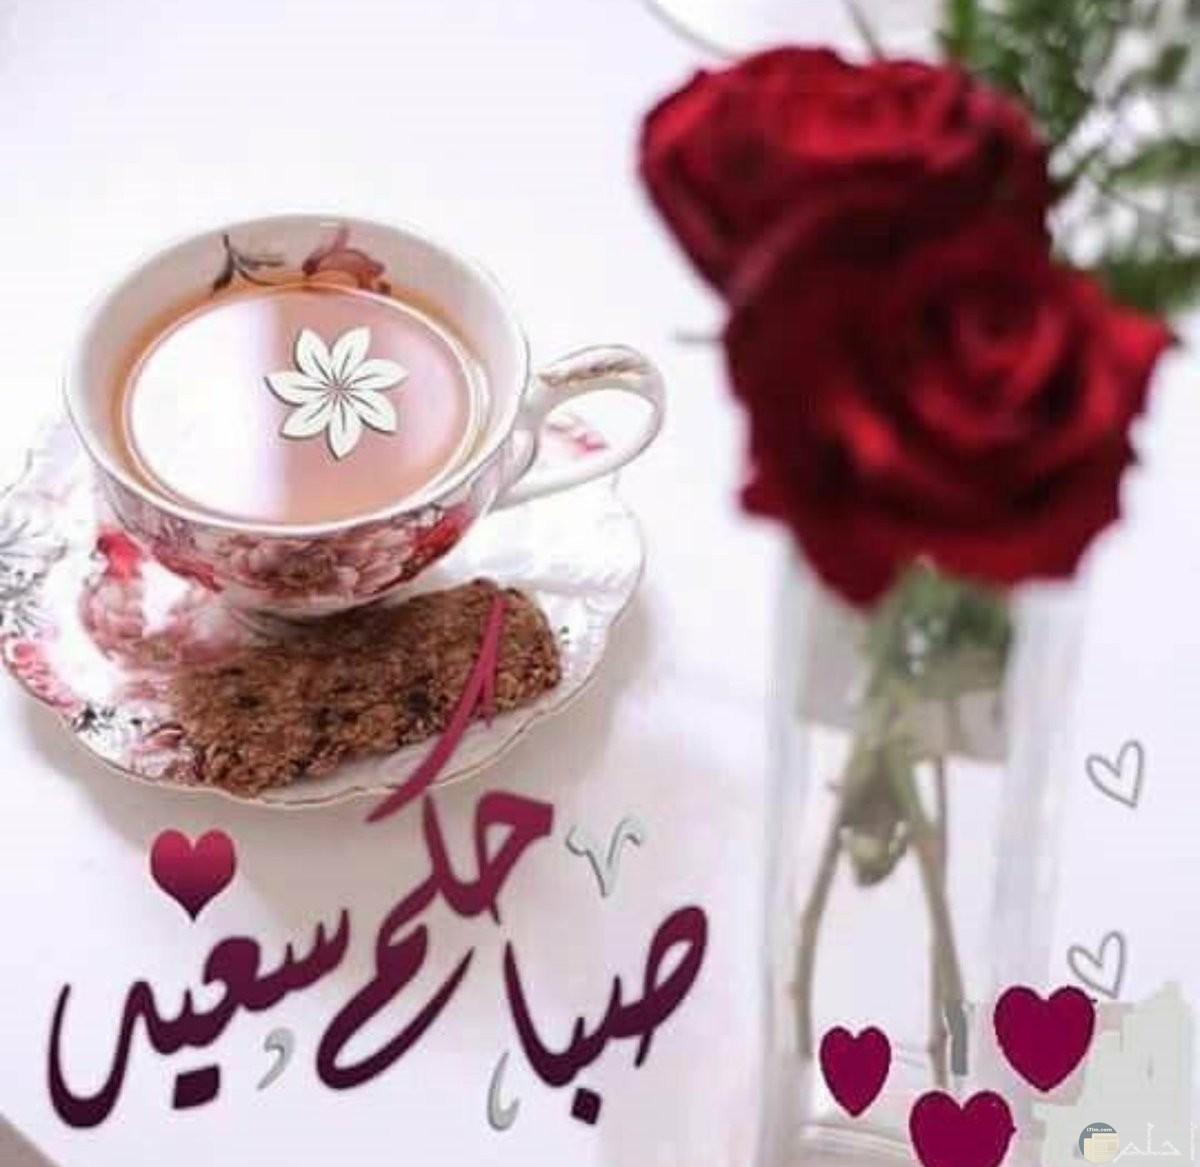 صباحكم سعيد